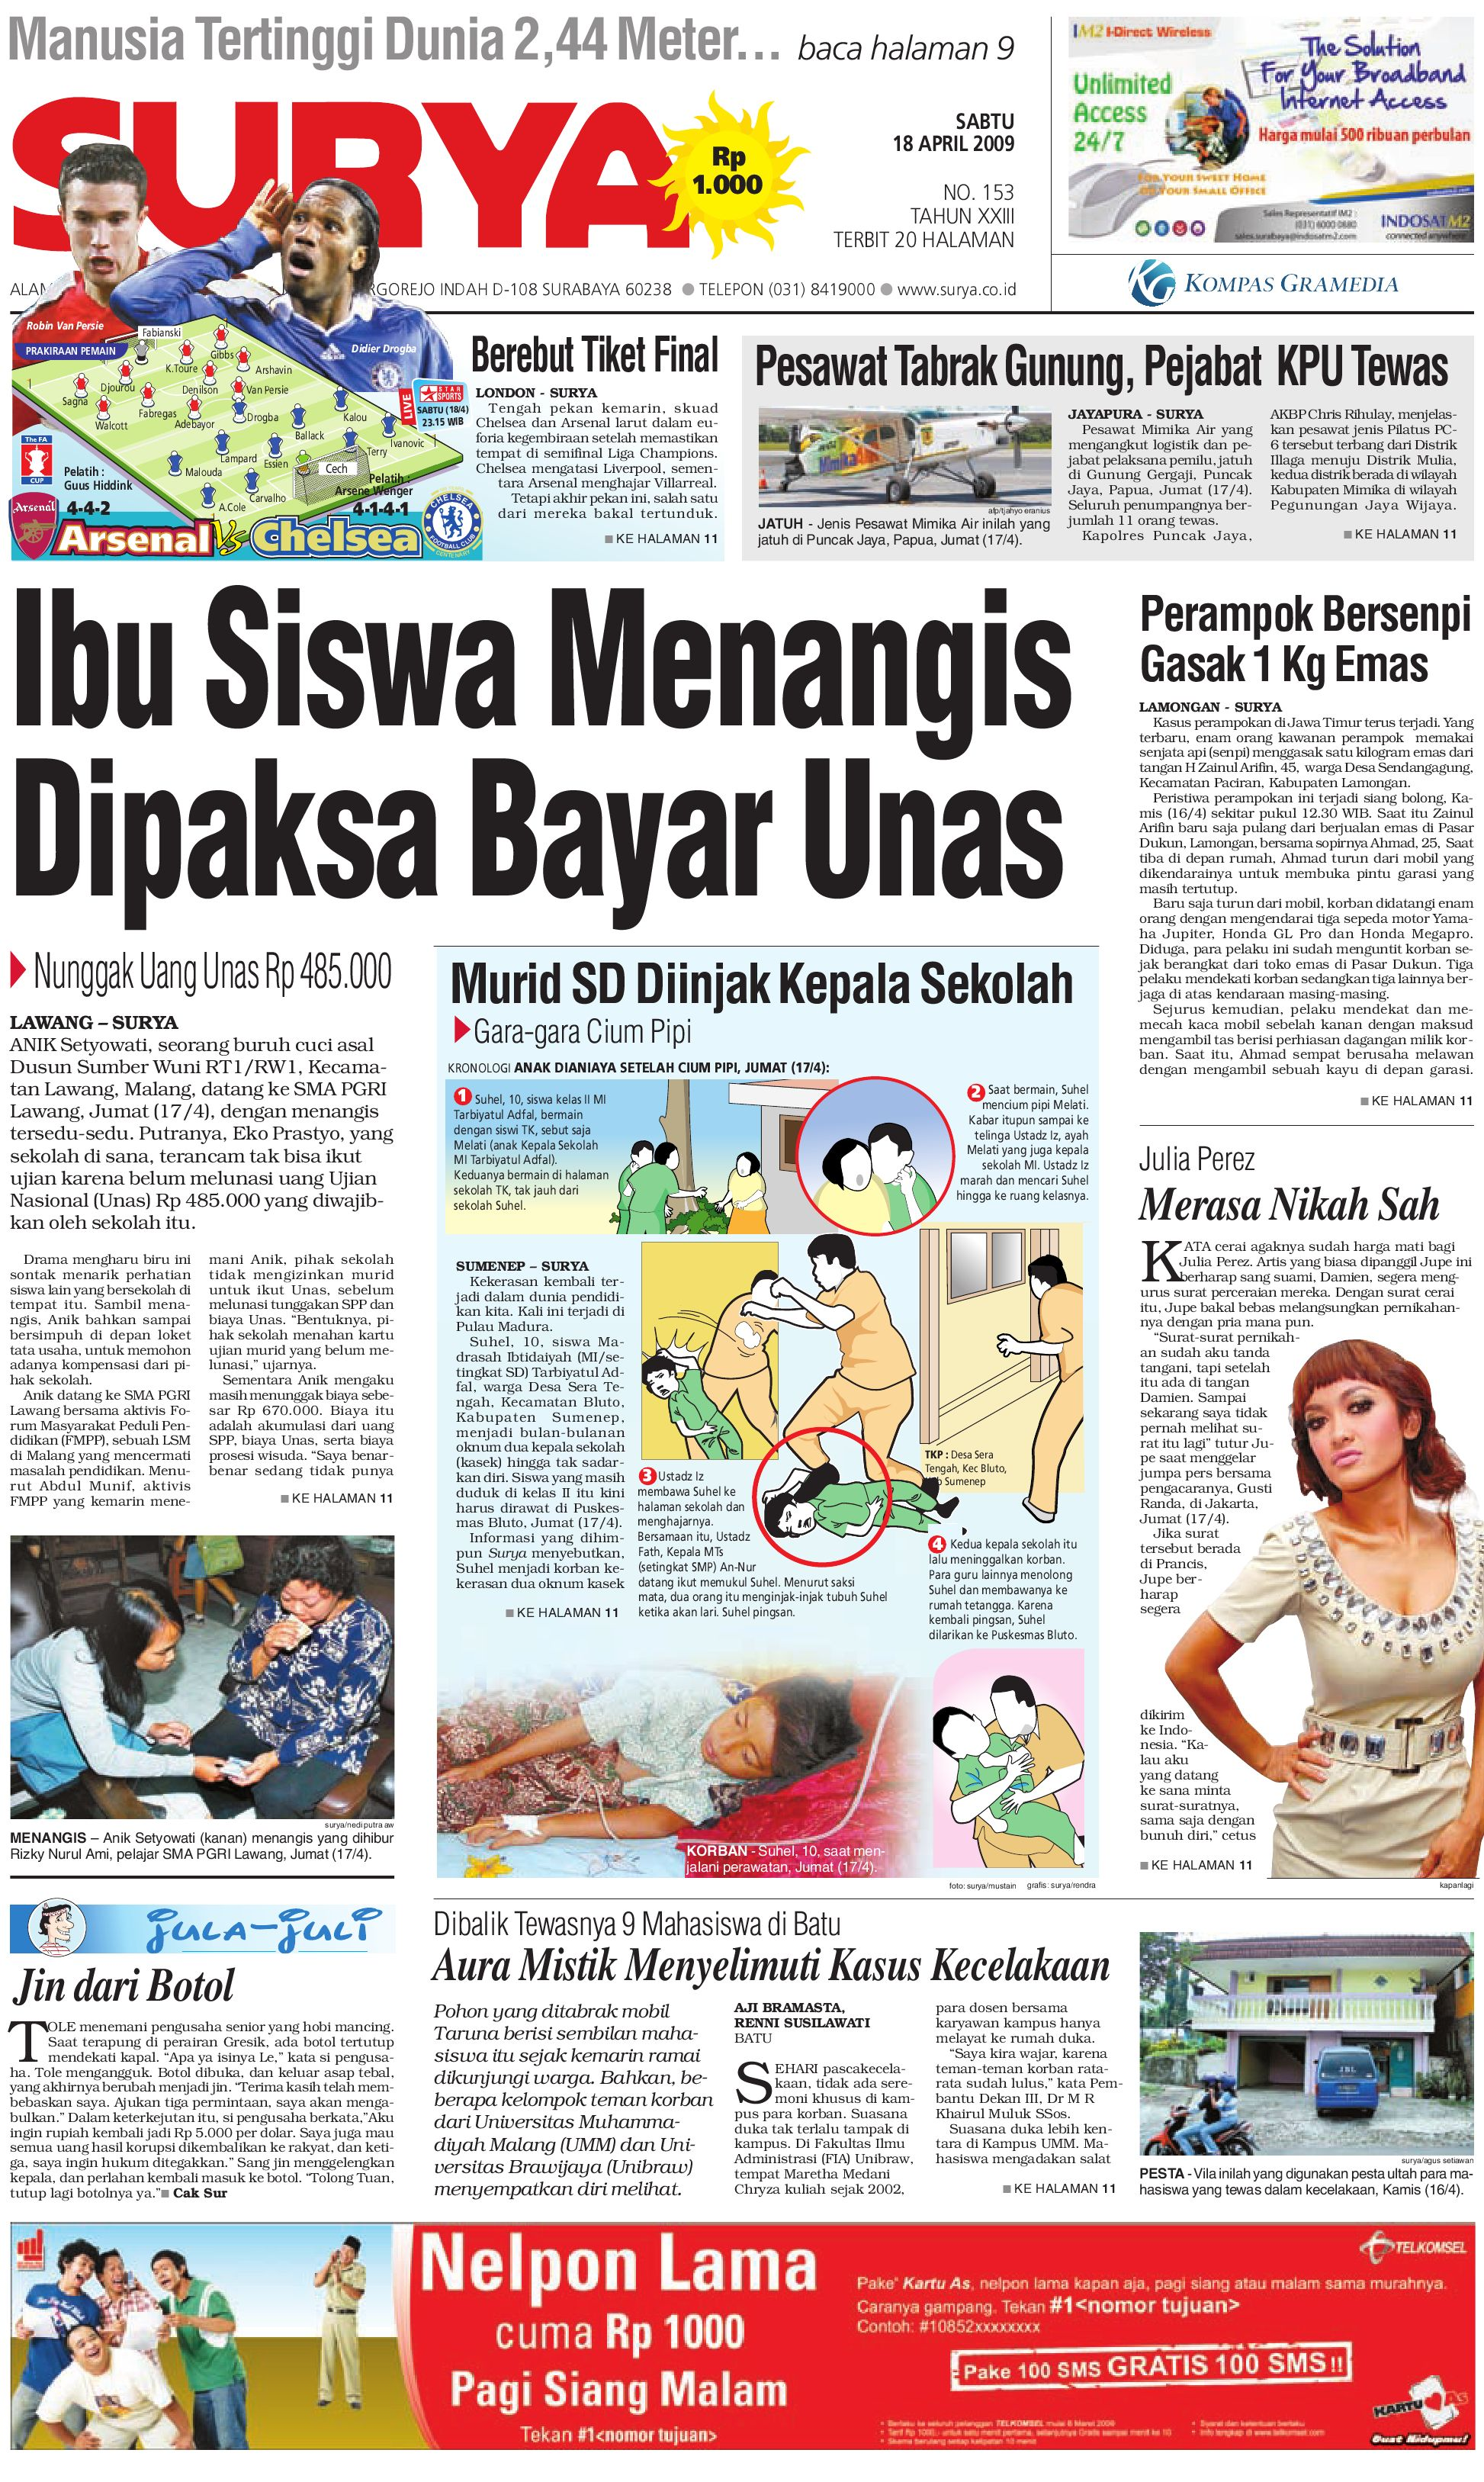 surya edisi cetak 20 mei 2009 by harian surya issuu